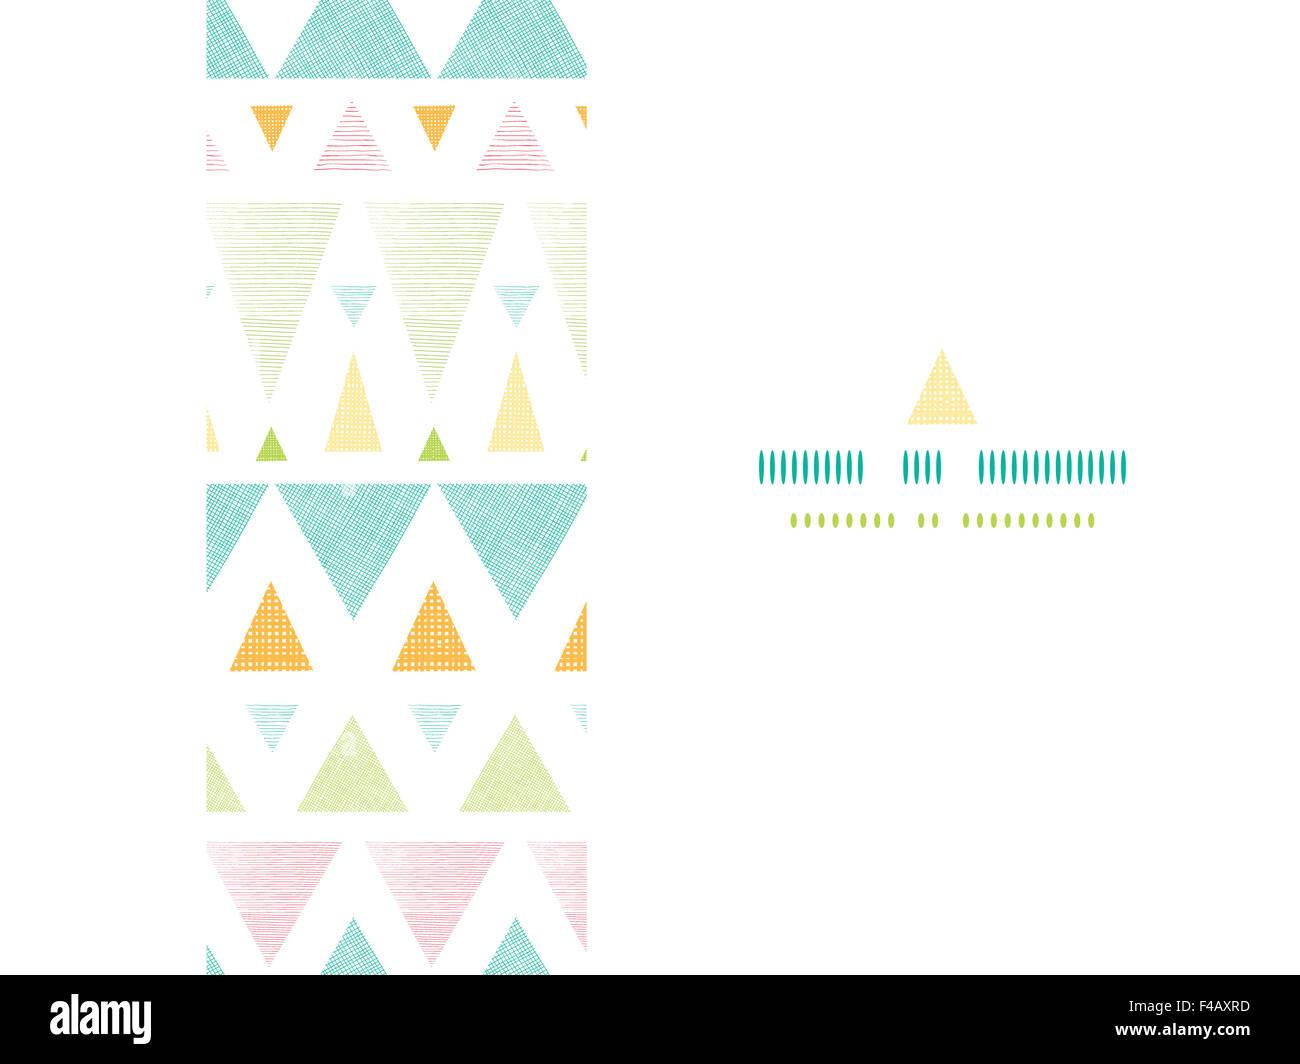 Pink Horizontal Stripes Imágenes De Stock & Pink Horizontal Stripes ...